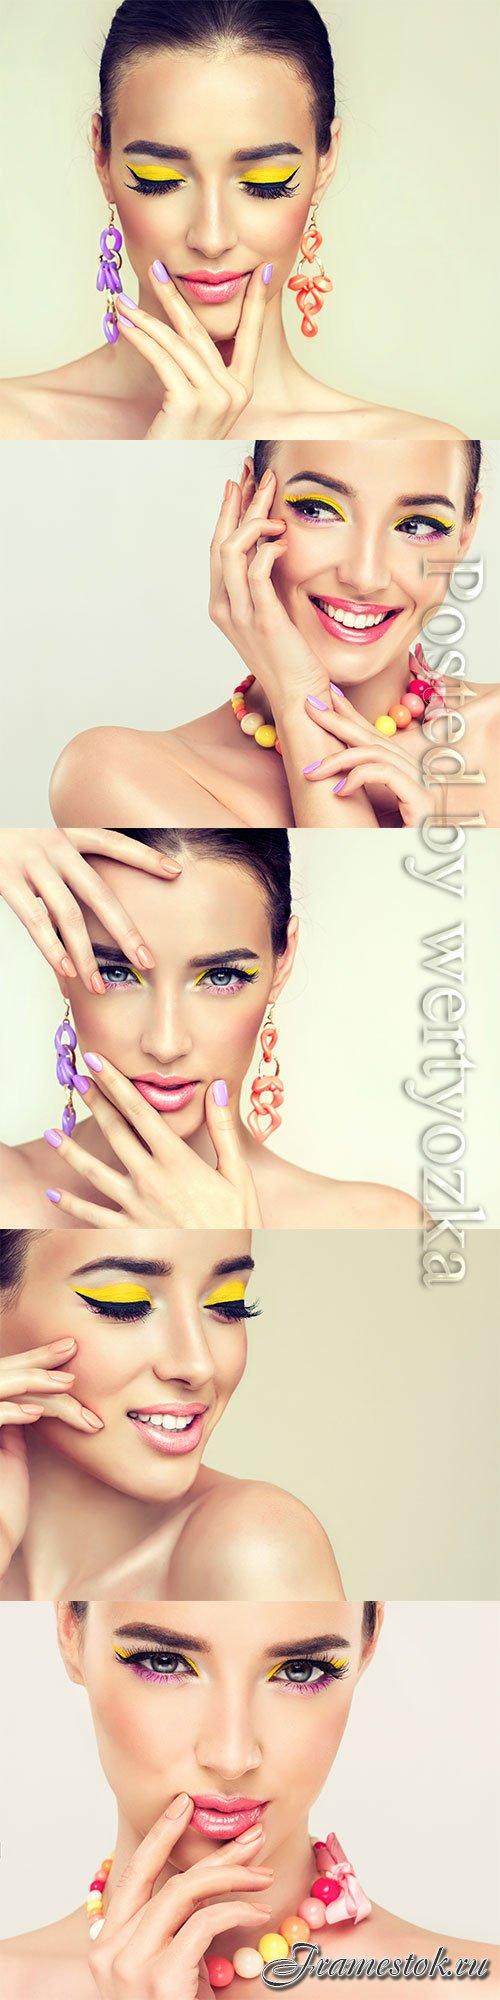 Stylish makeup for women stock photo